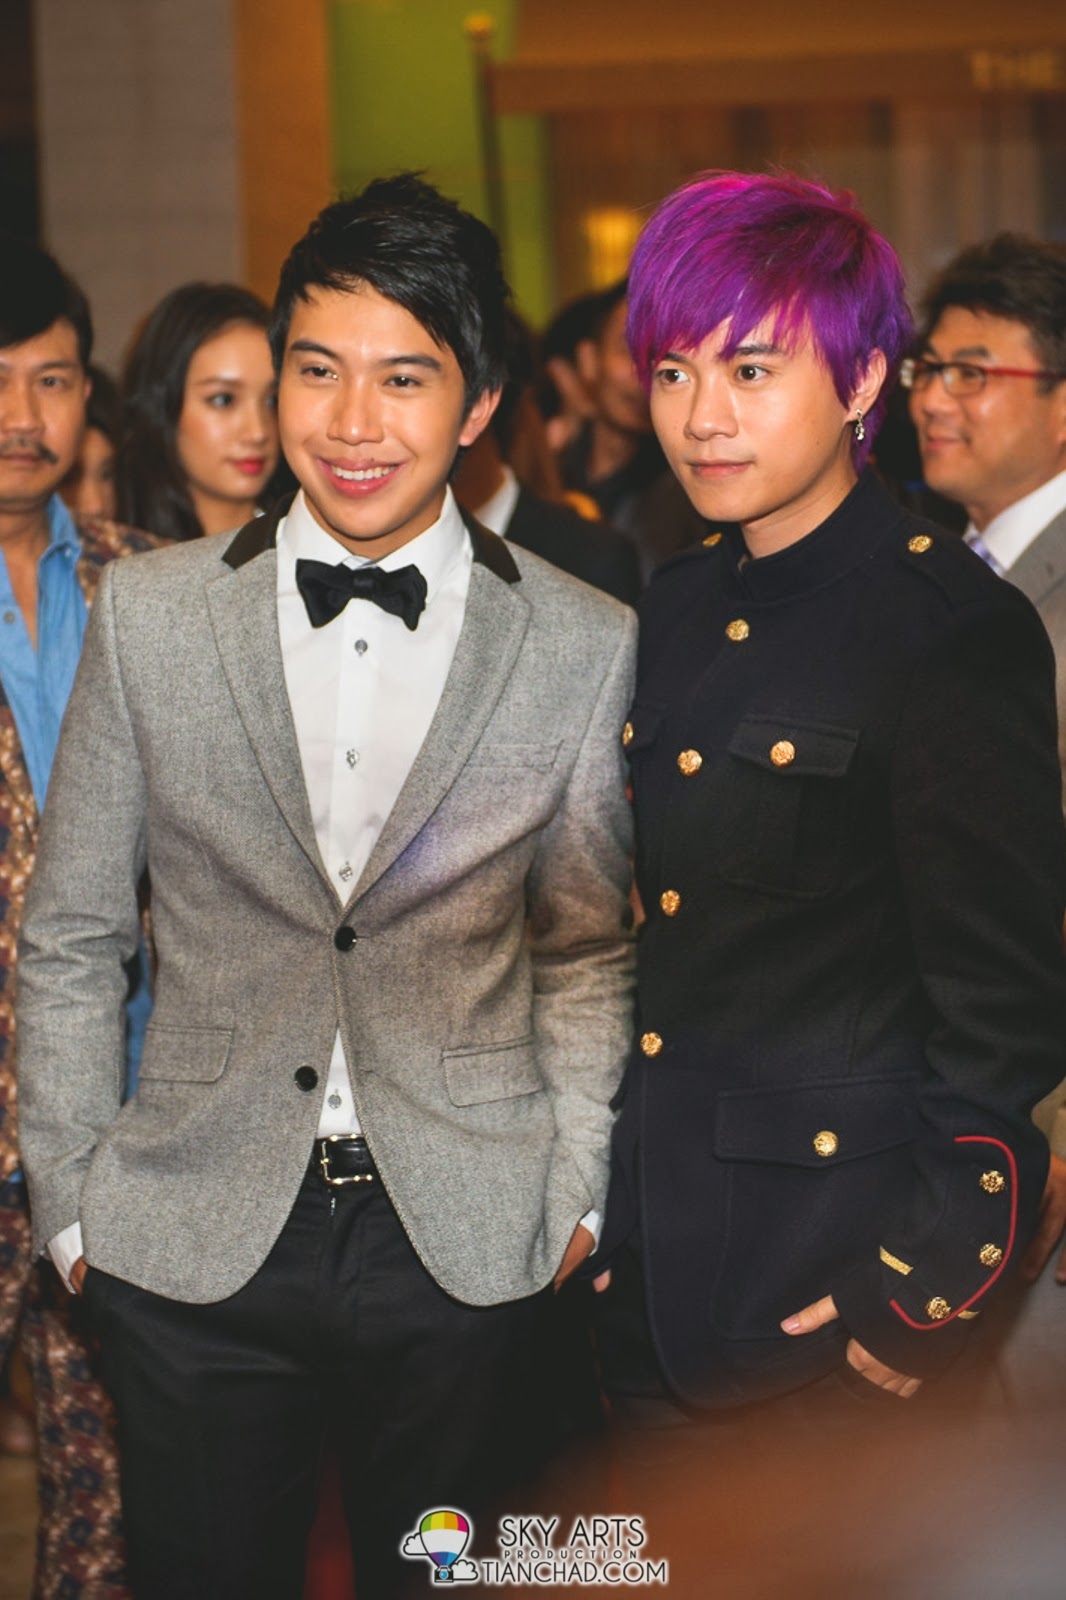 Charlie Goh 吴清樑 and Bao Er Cong 包尔琮